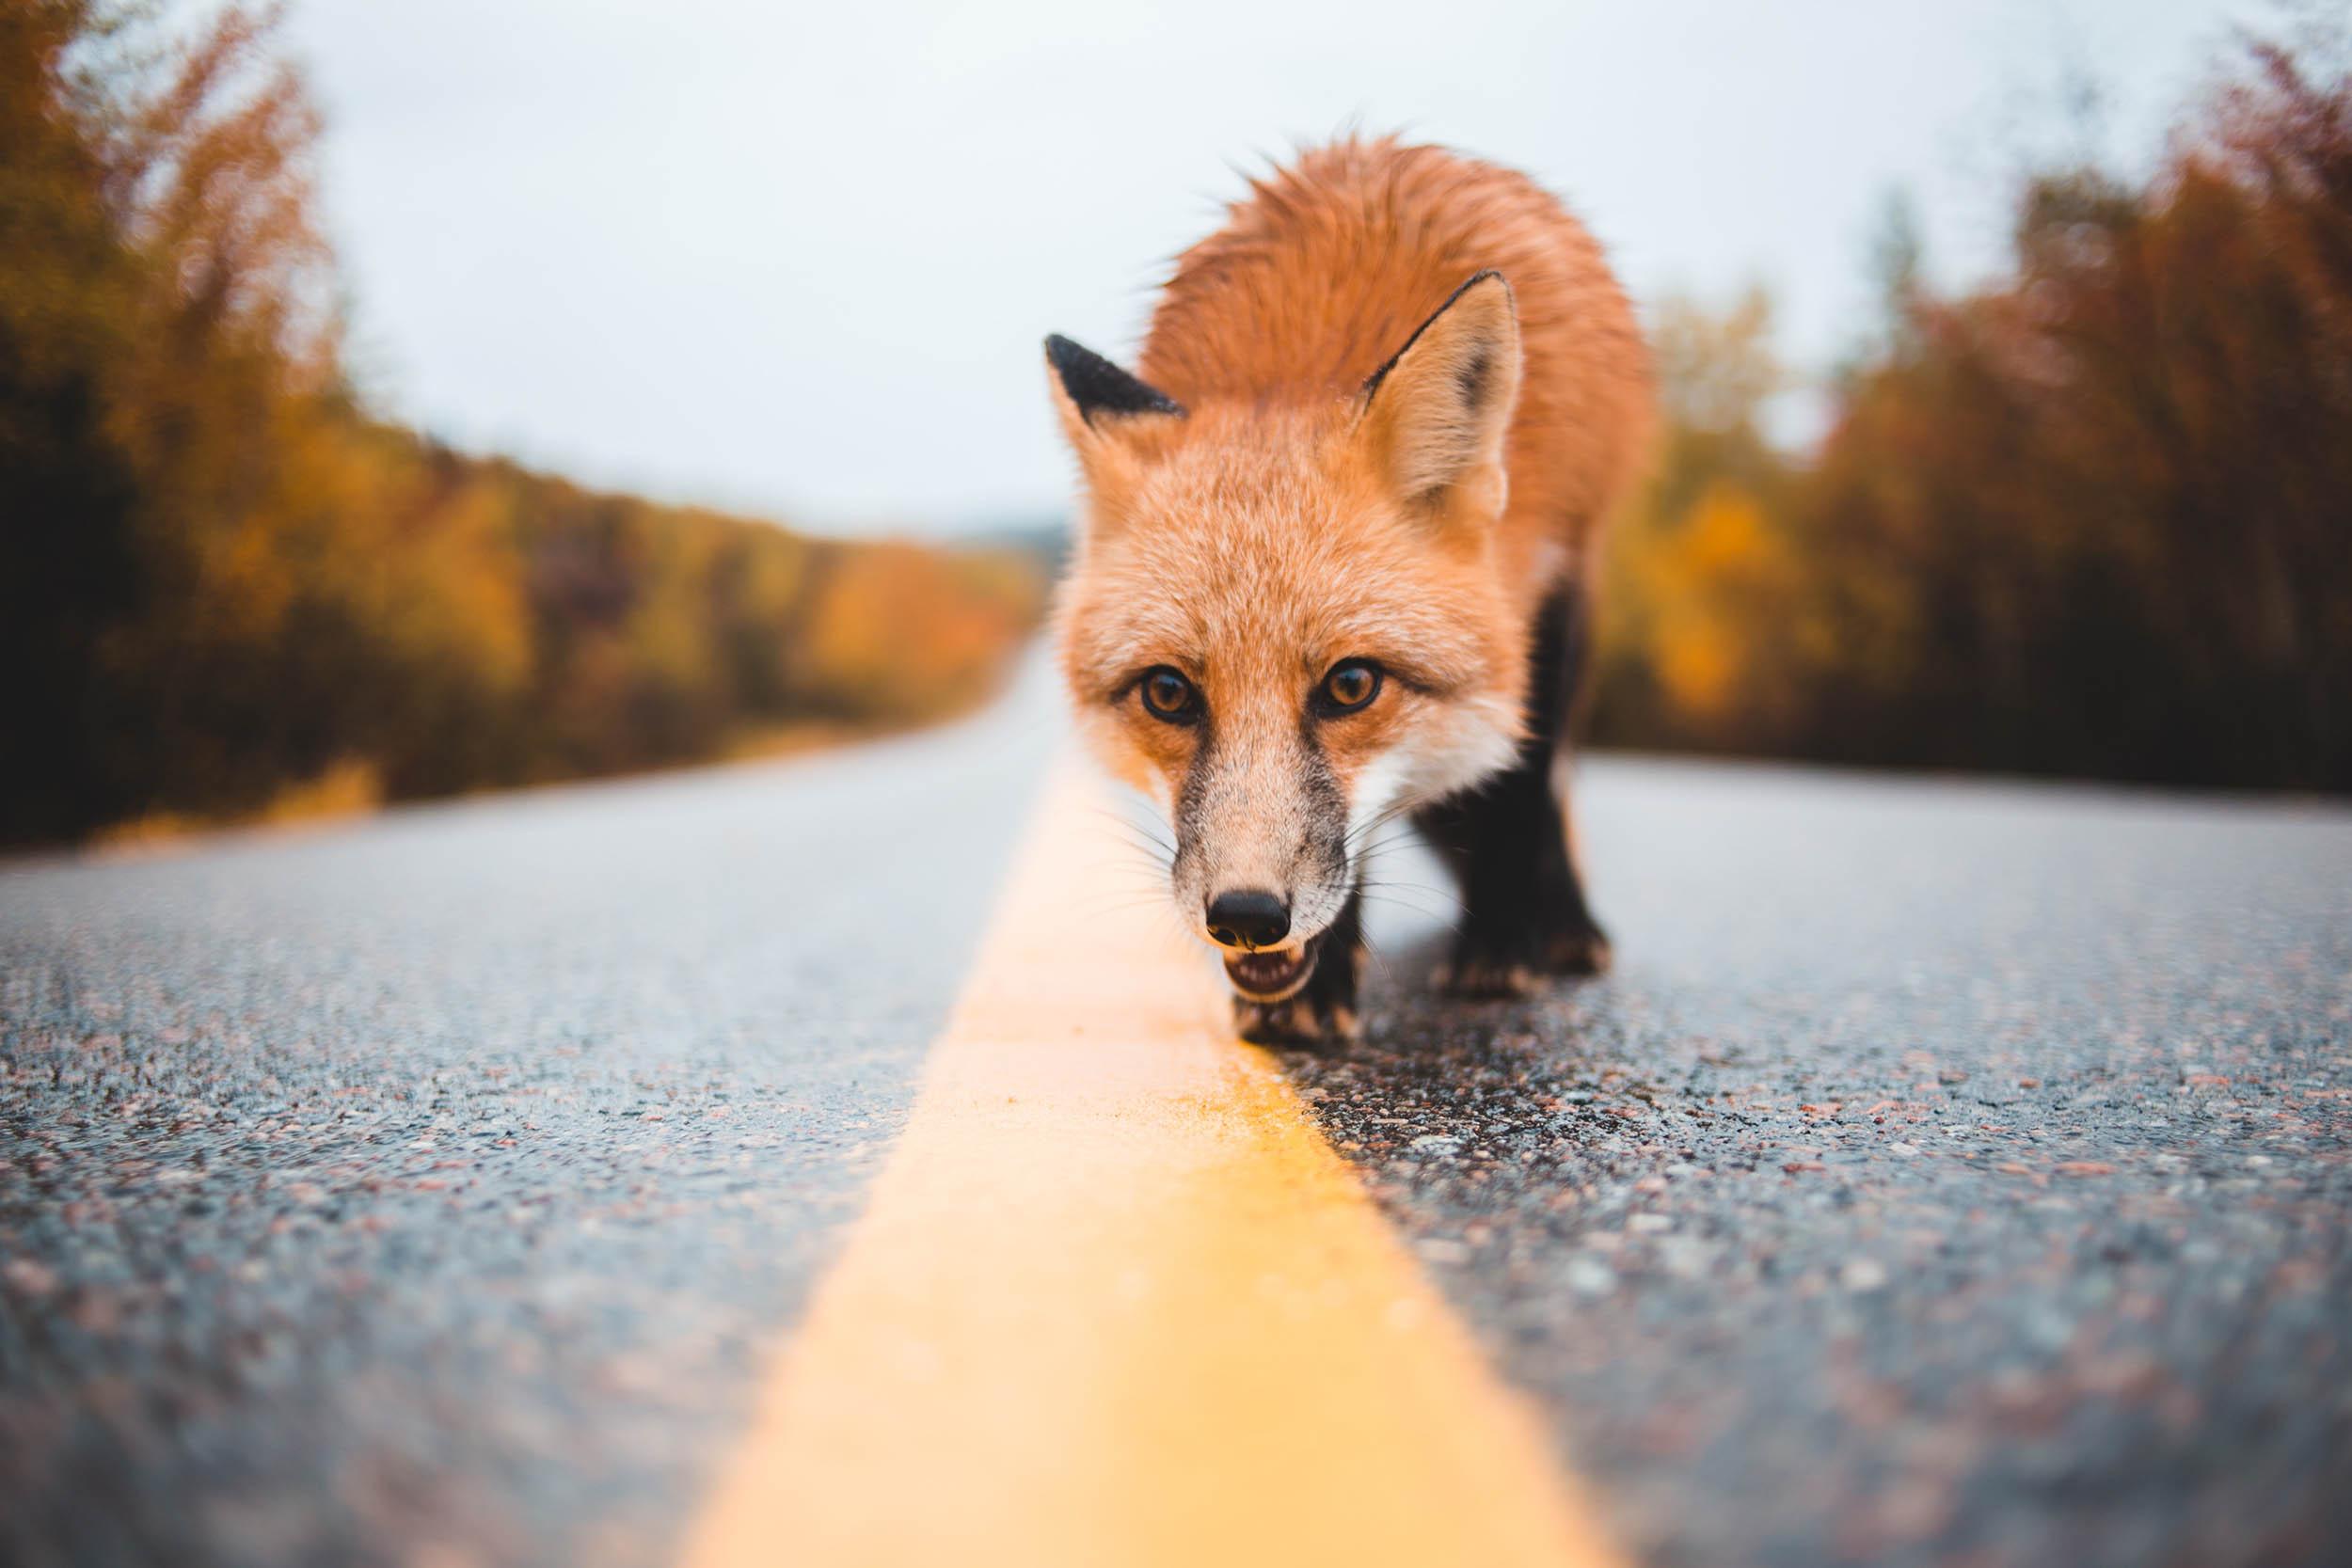 behavior animals basics photography Photographing animals in the wild